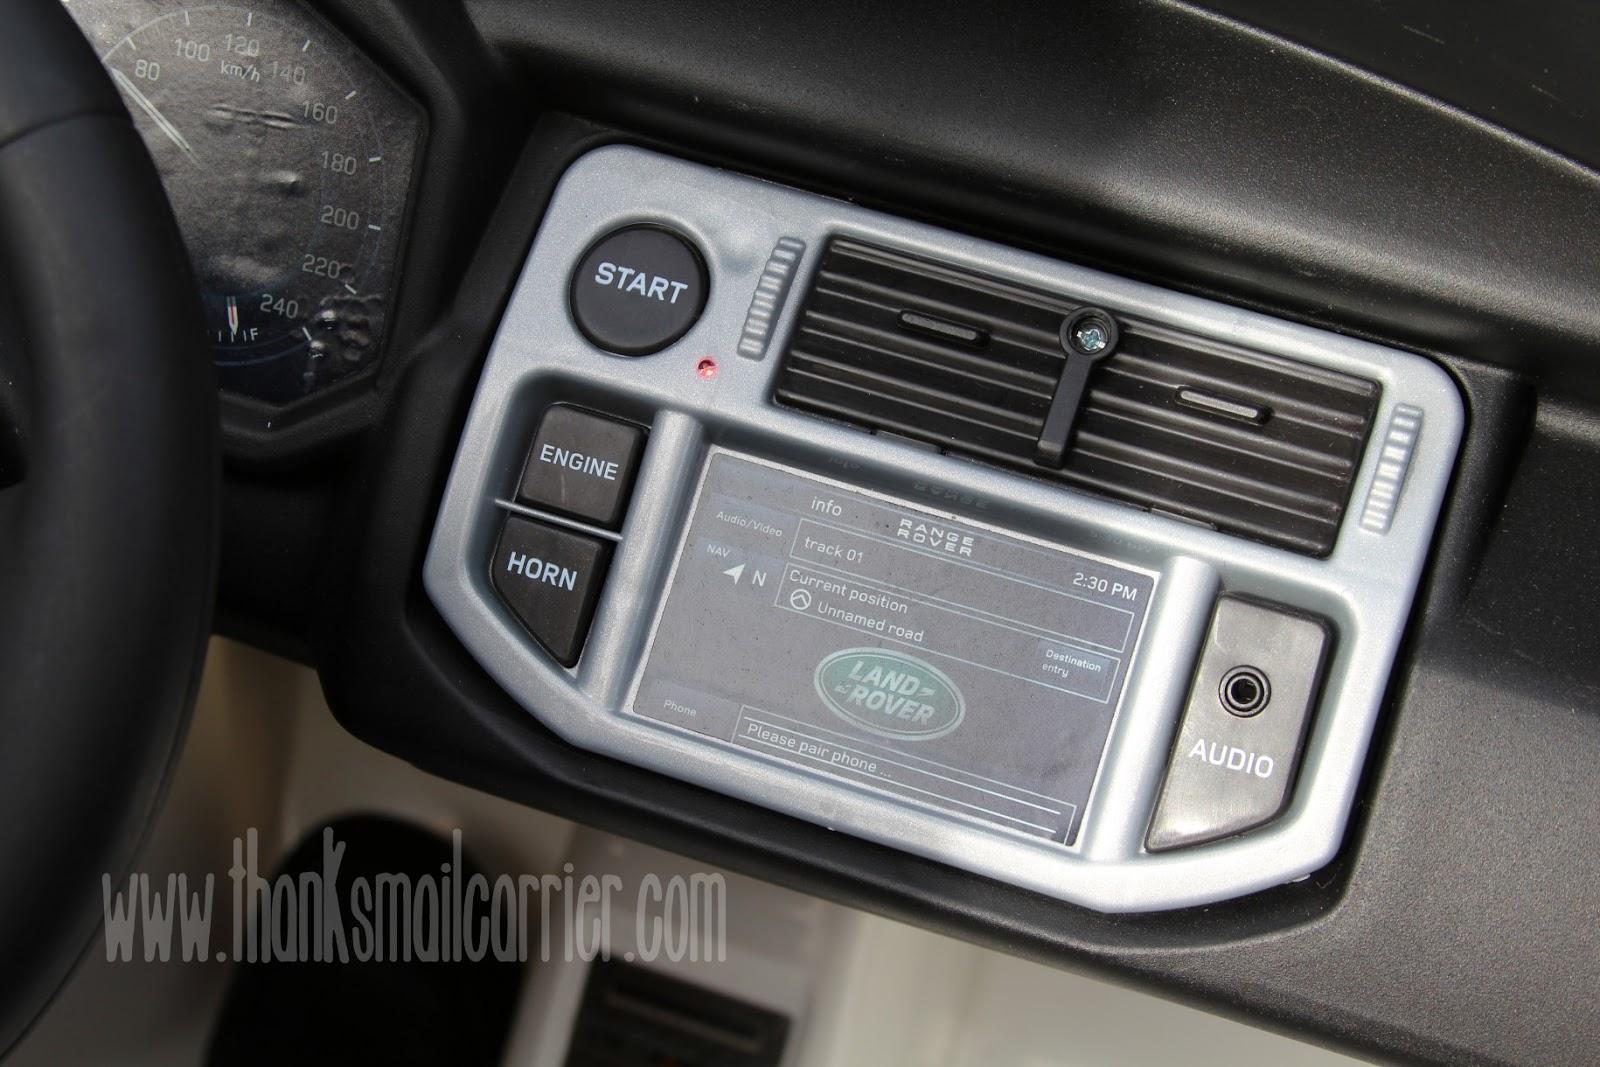 Avigo Range Rover audio